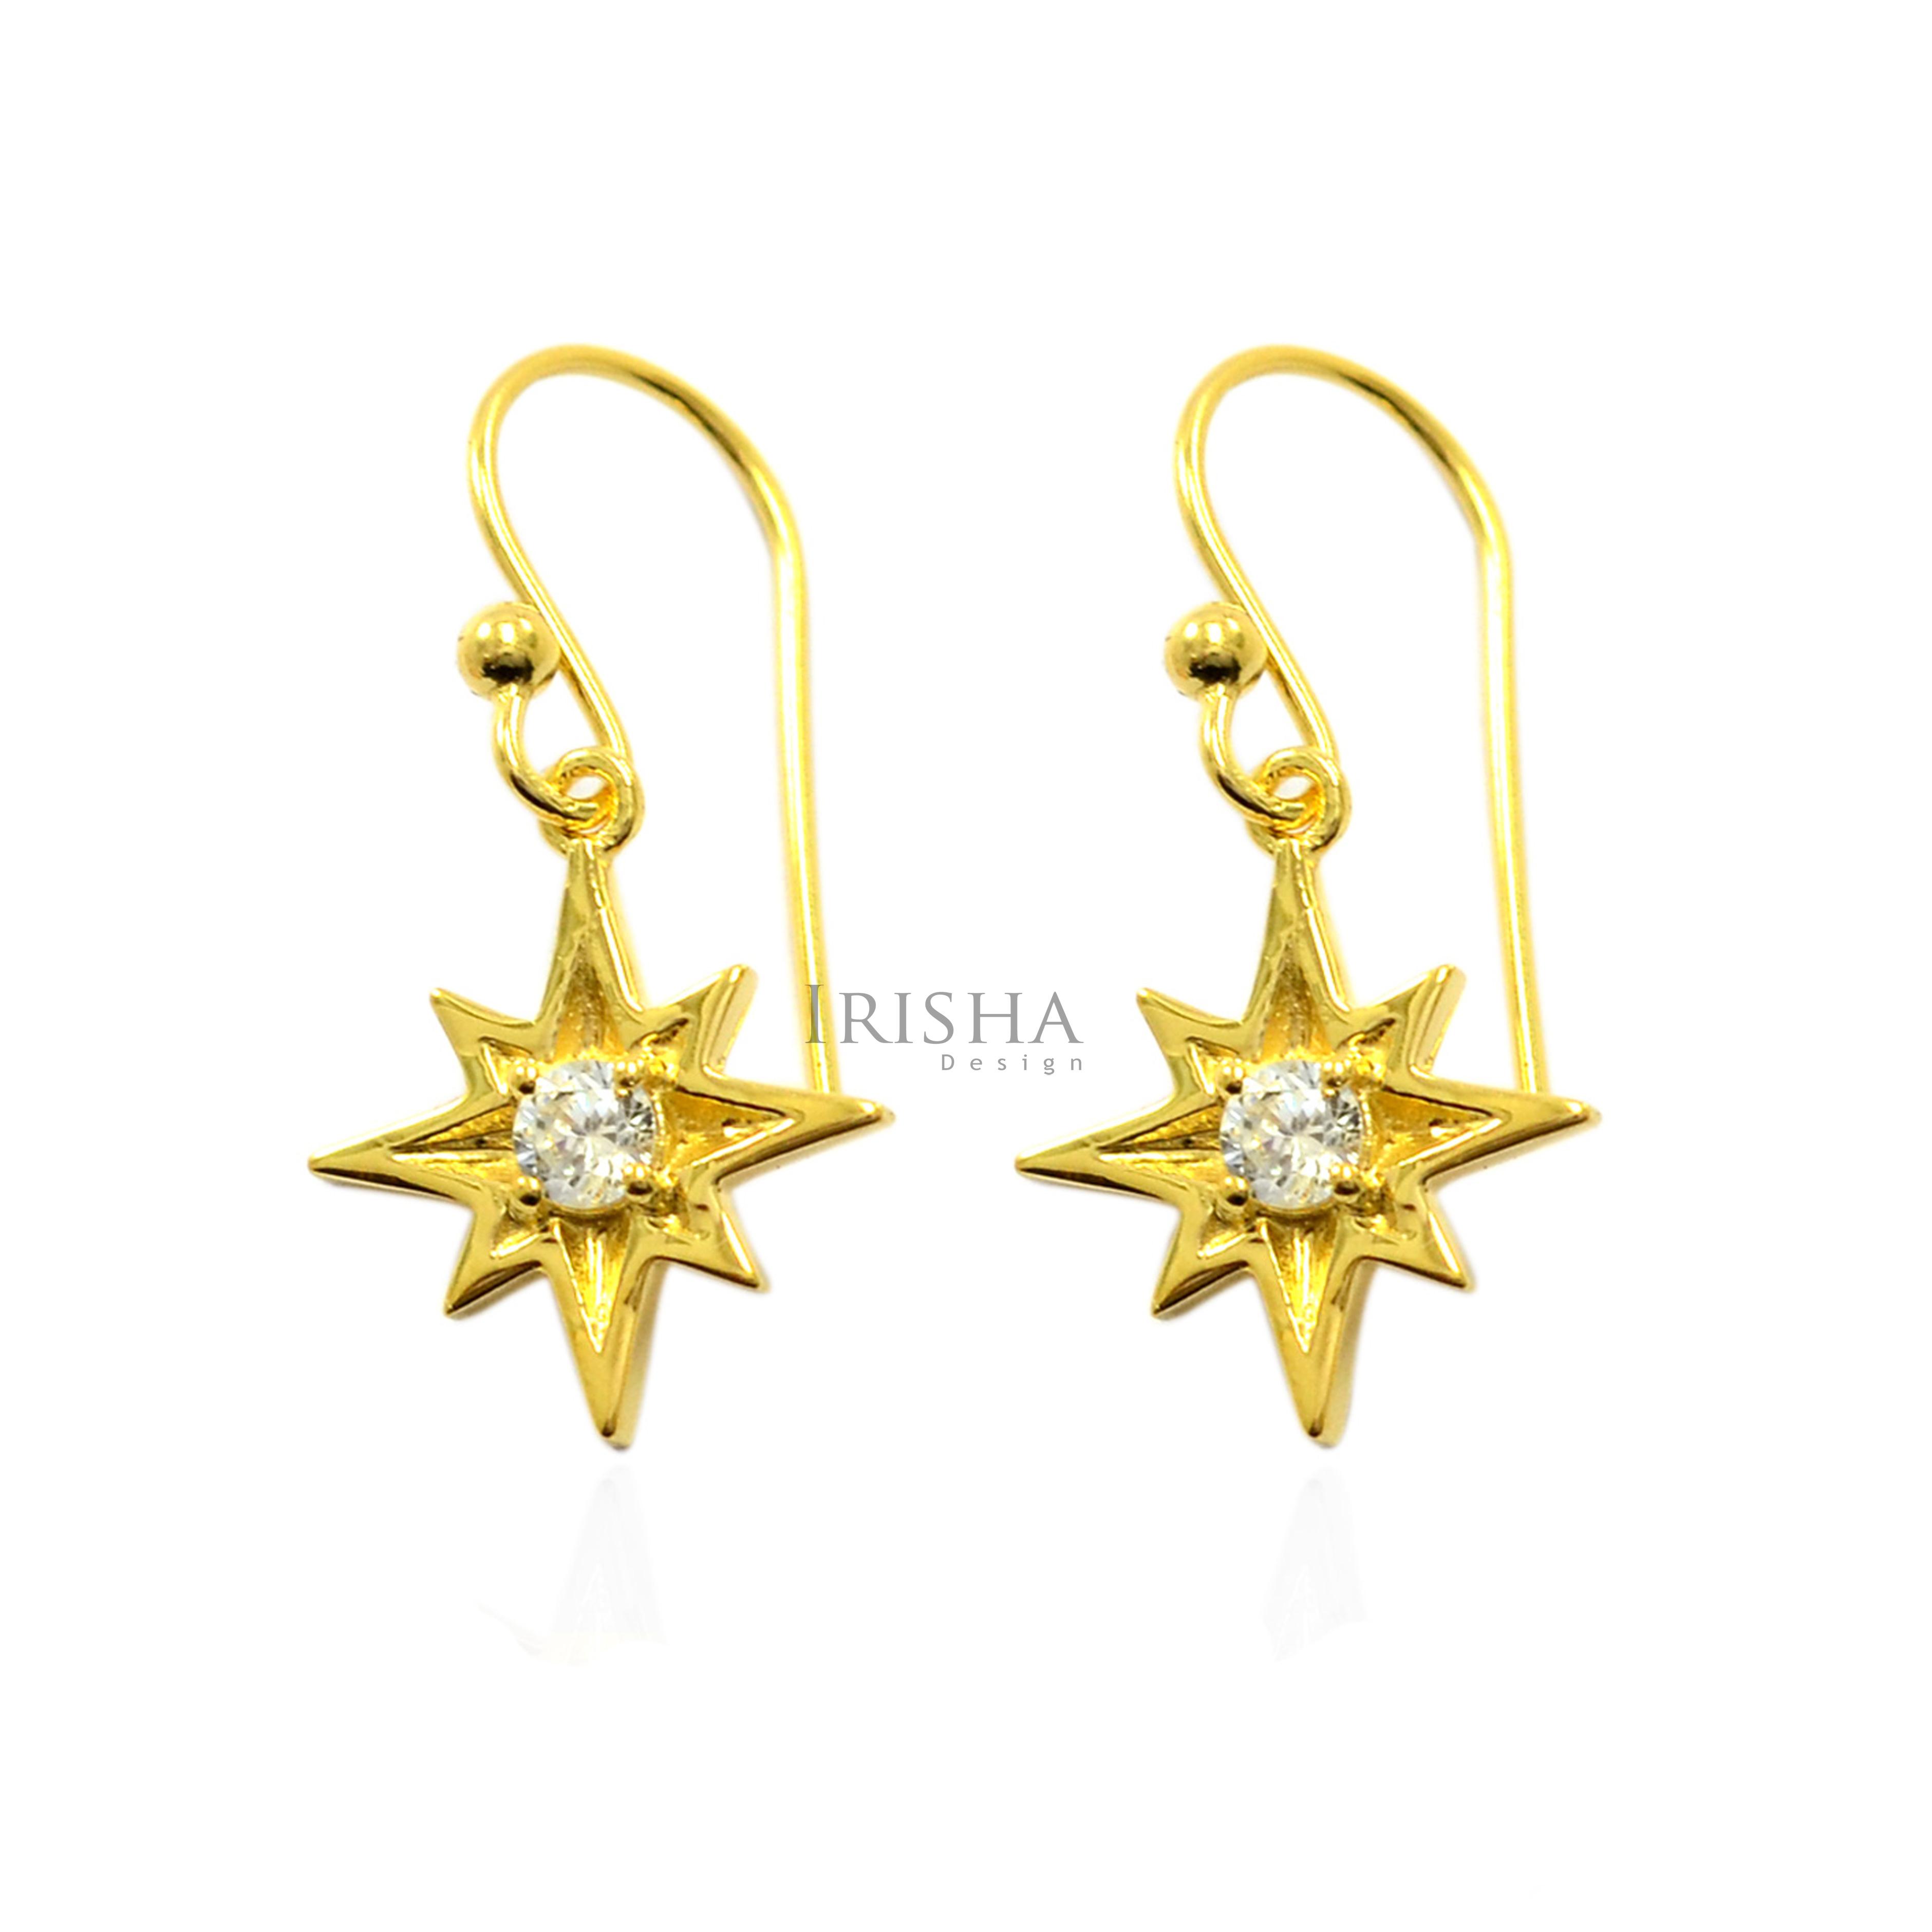 14K Gold 0.15 Ct. Genuine Diamond Starburst Hook Earrings Christmas Fine Jewelry